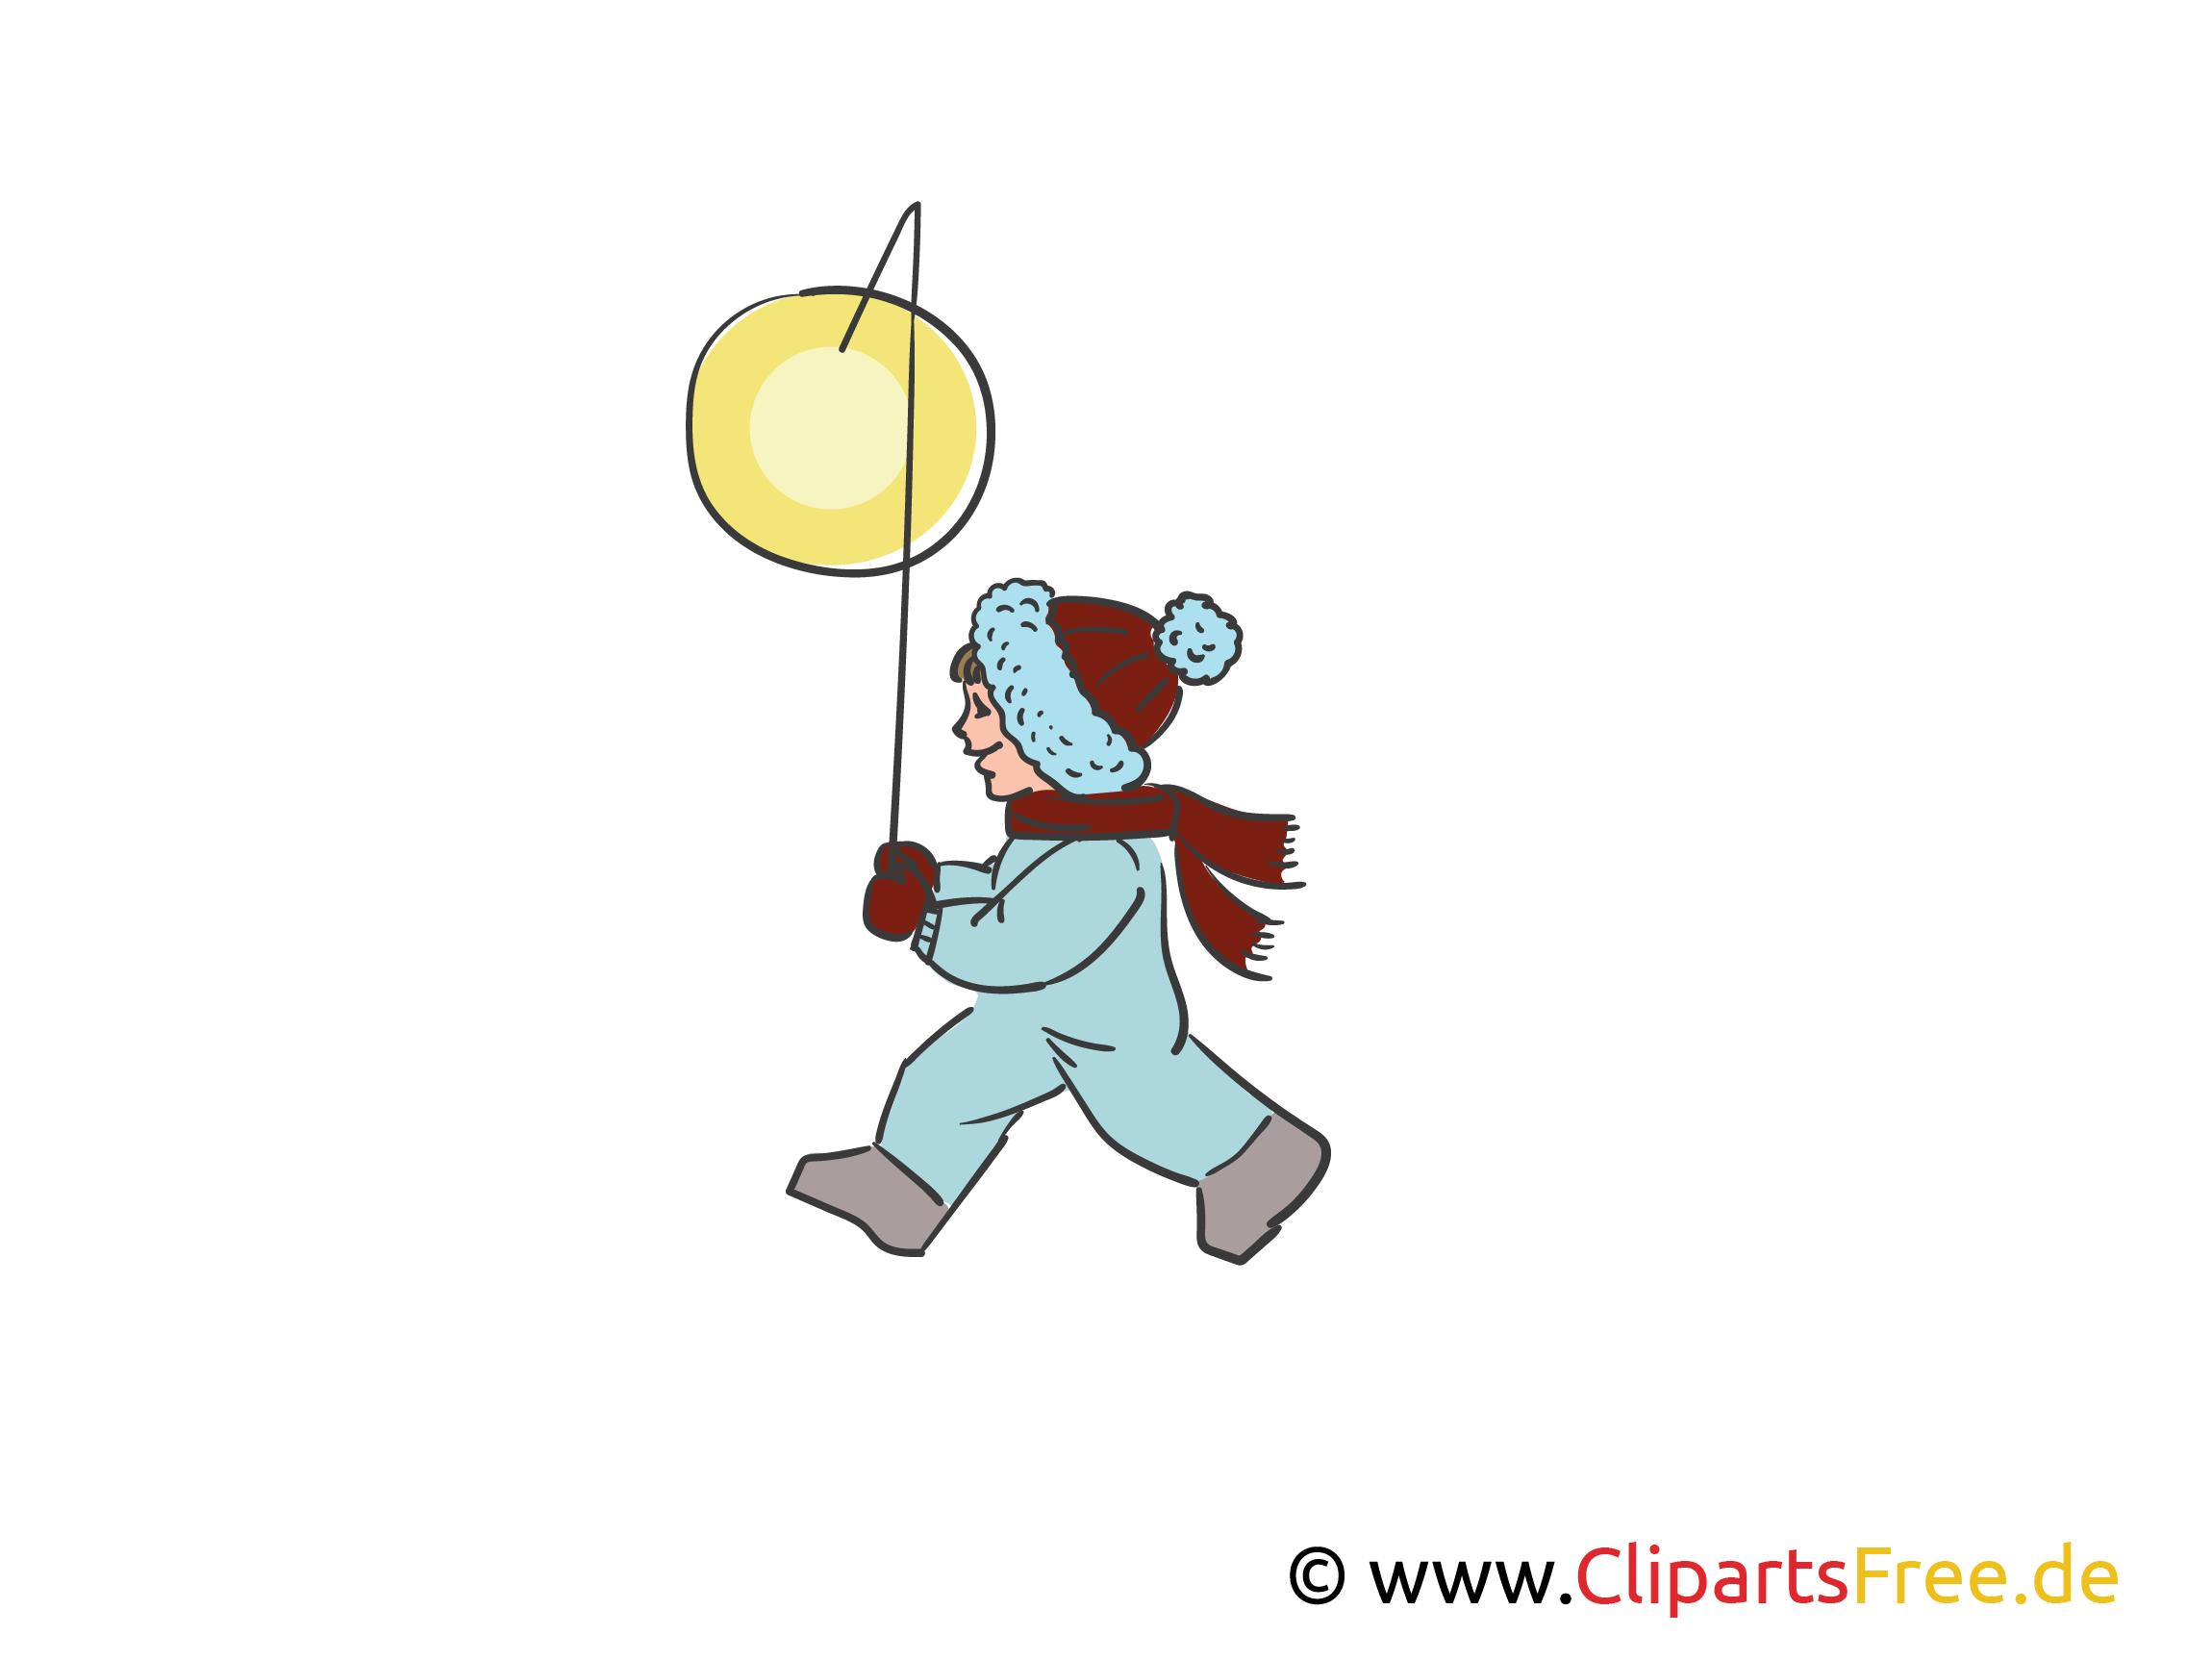 Laterne, Laterne, Sonne, Mond und Sterne Illustration, Clipart, Bild